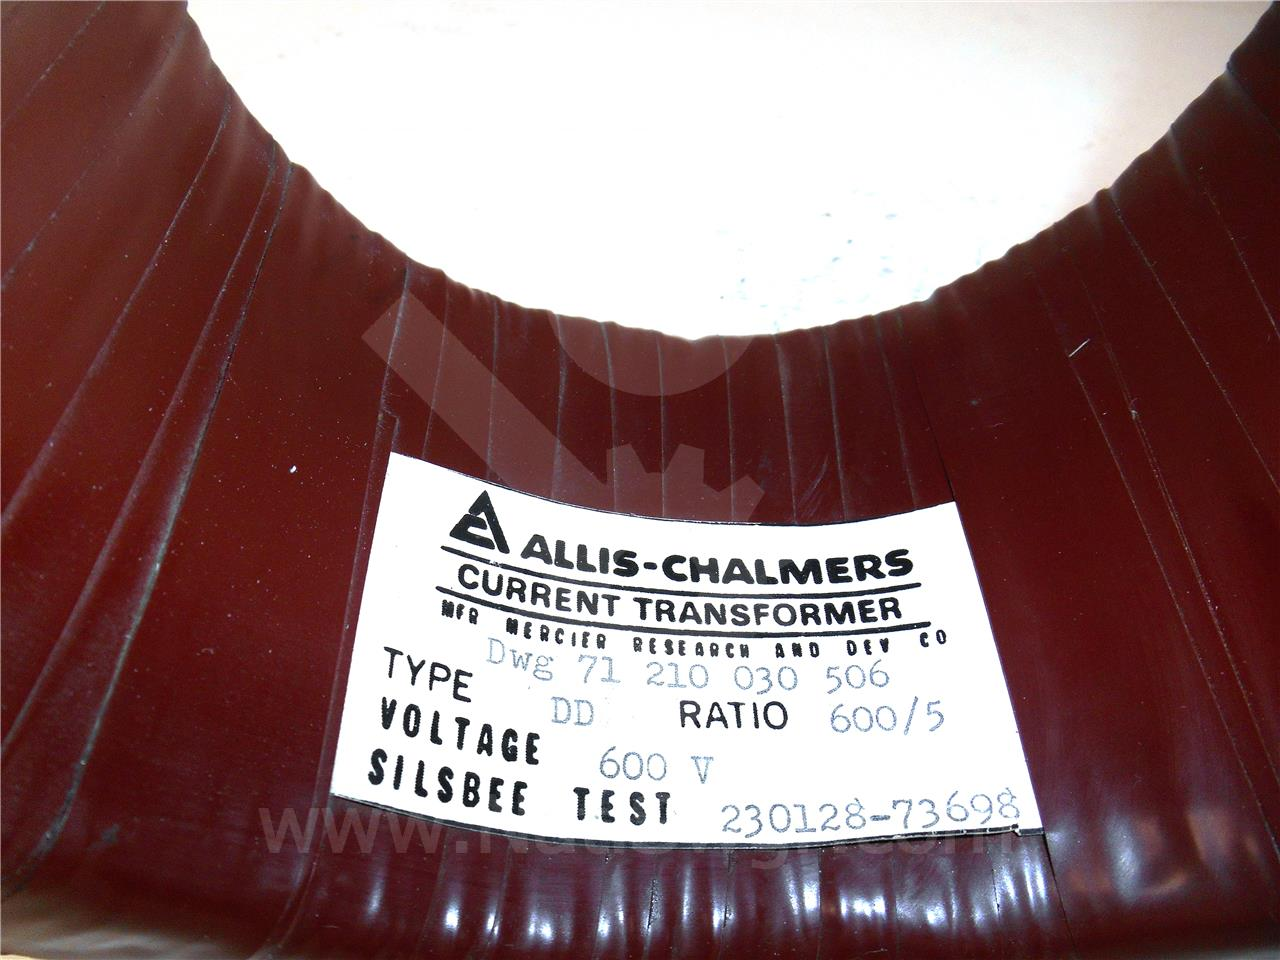 71-210-030-506 Allis Chalmers CURRENT TRANSFORMER, 600:5 DD, WINDOW, 5KV